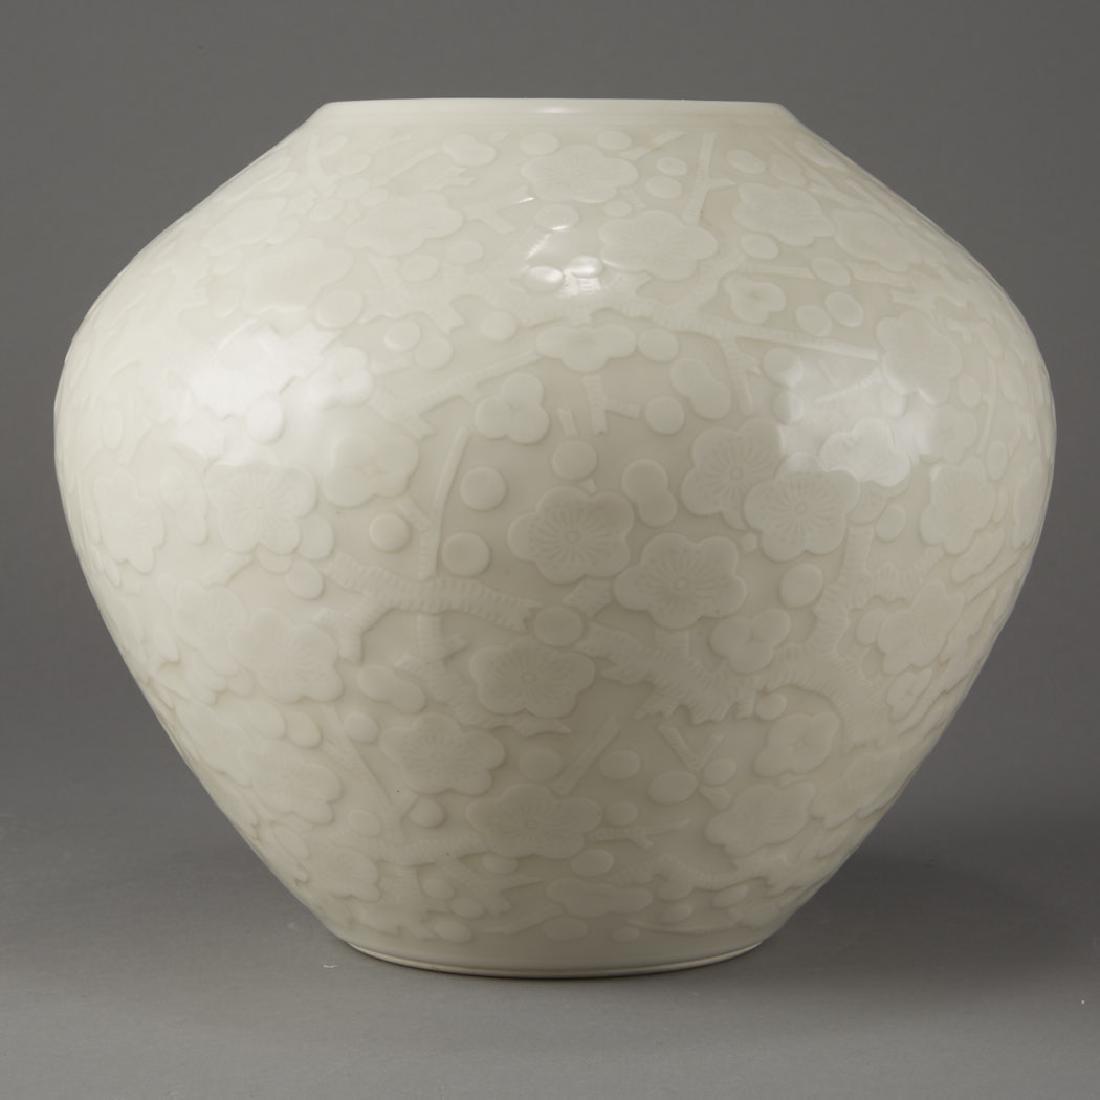 Mizusashi Japanese Porcelain By Seifu Yohei III